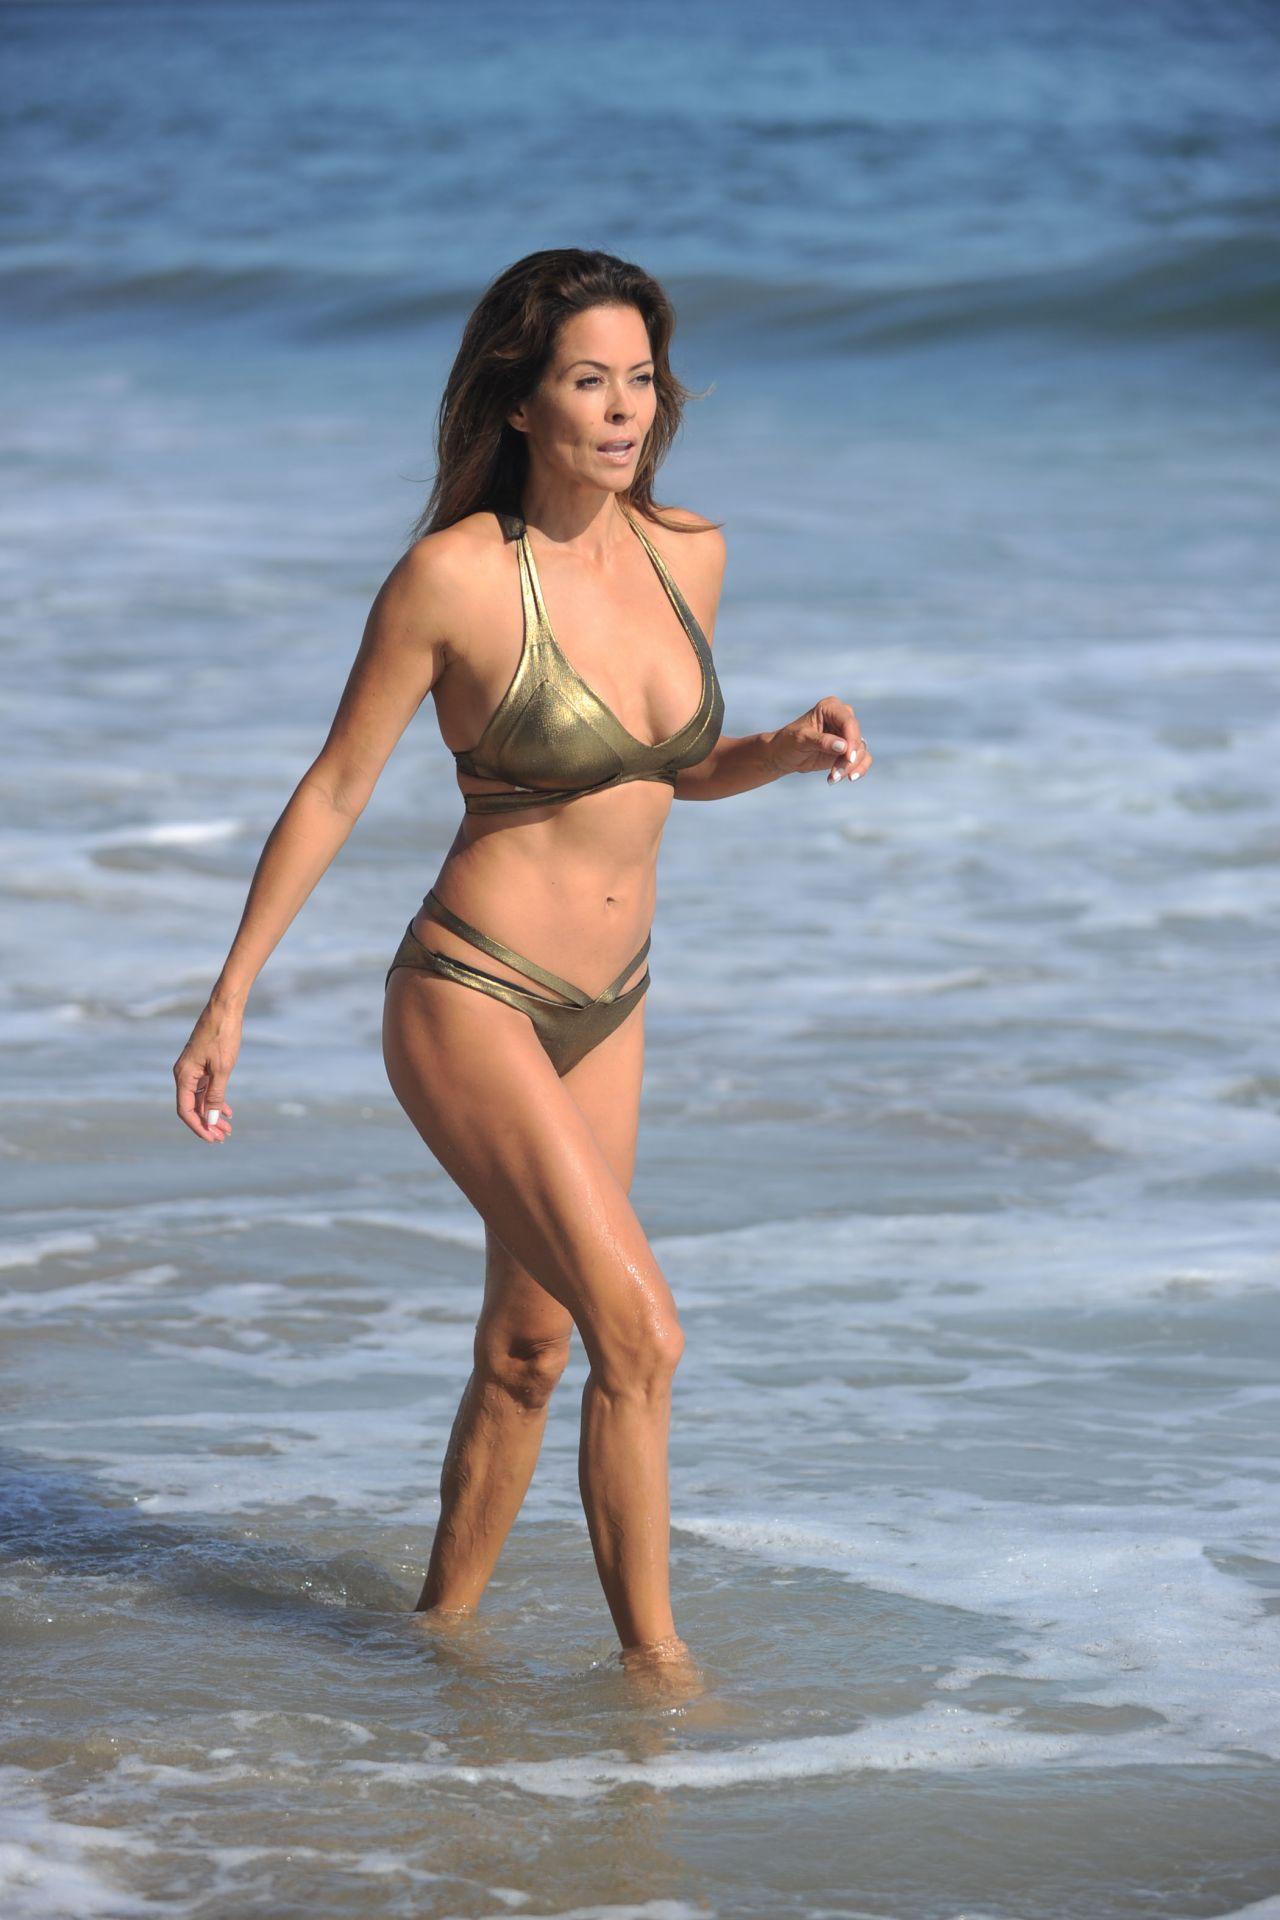 also very fitness Boob charm chelsea her swimmer/runner who